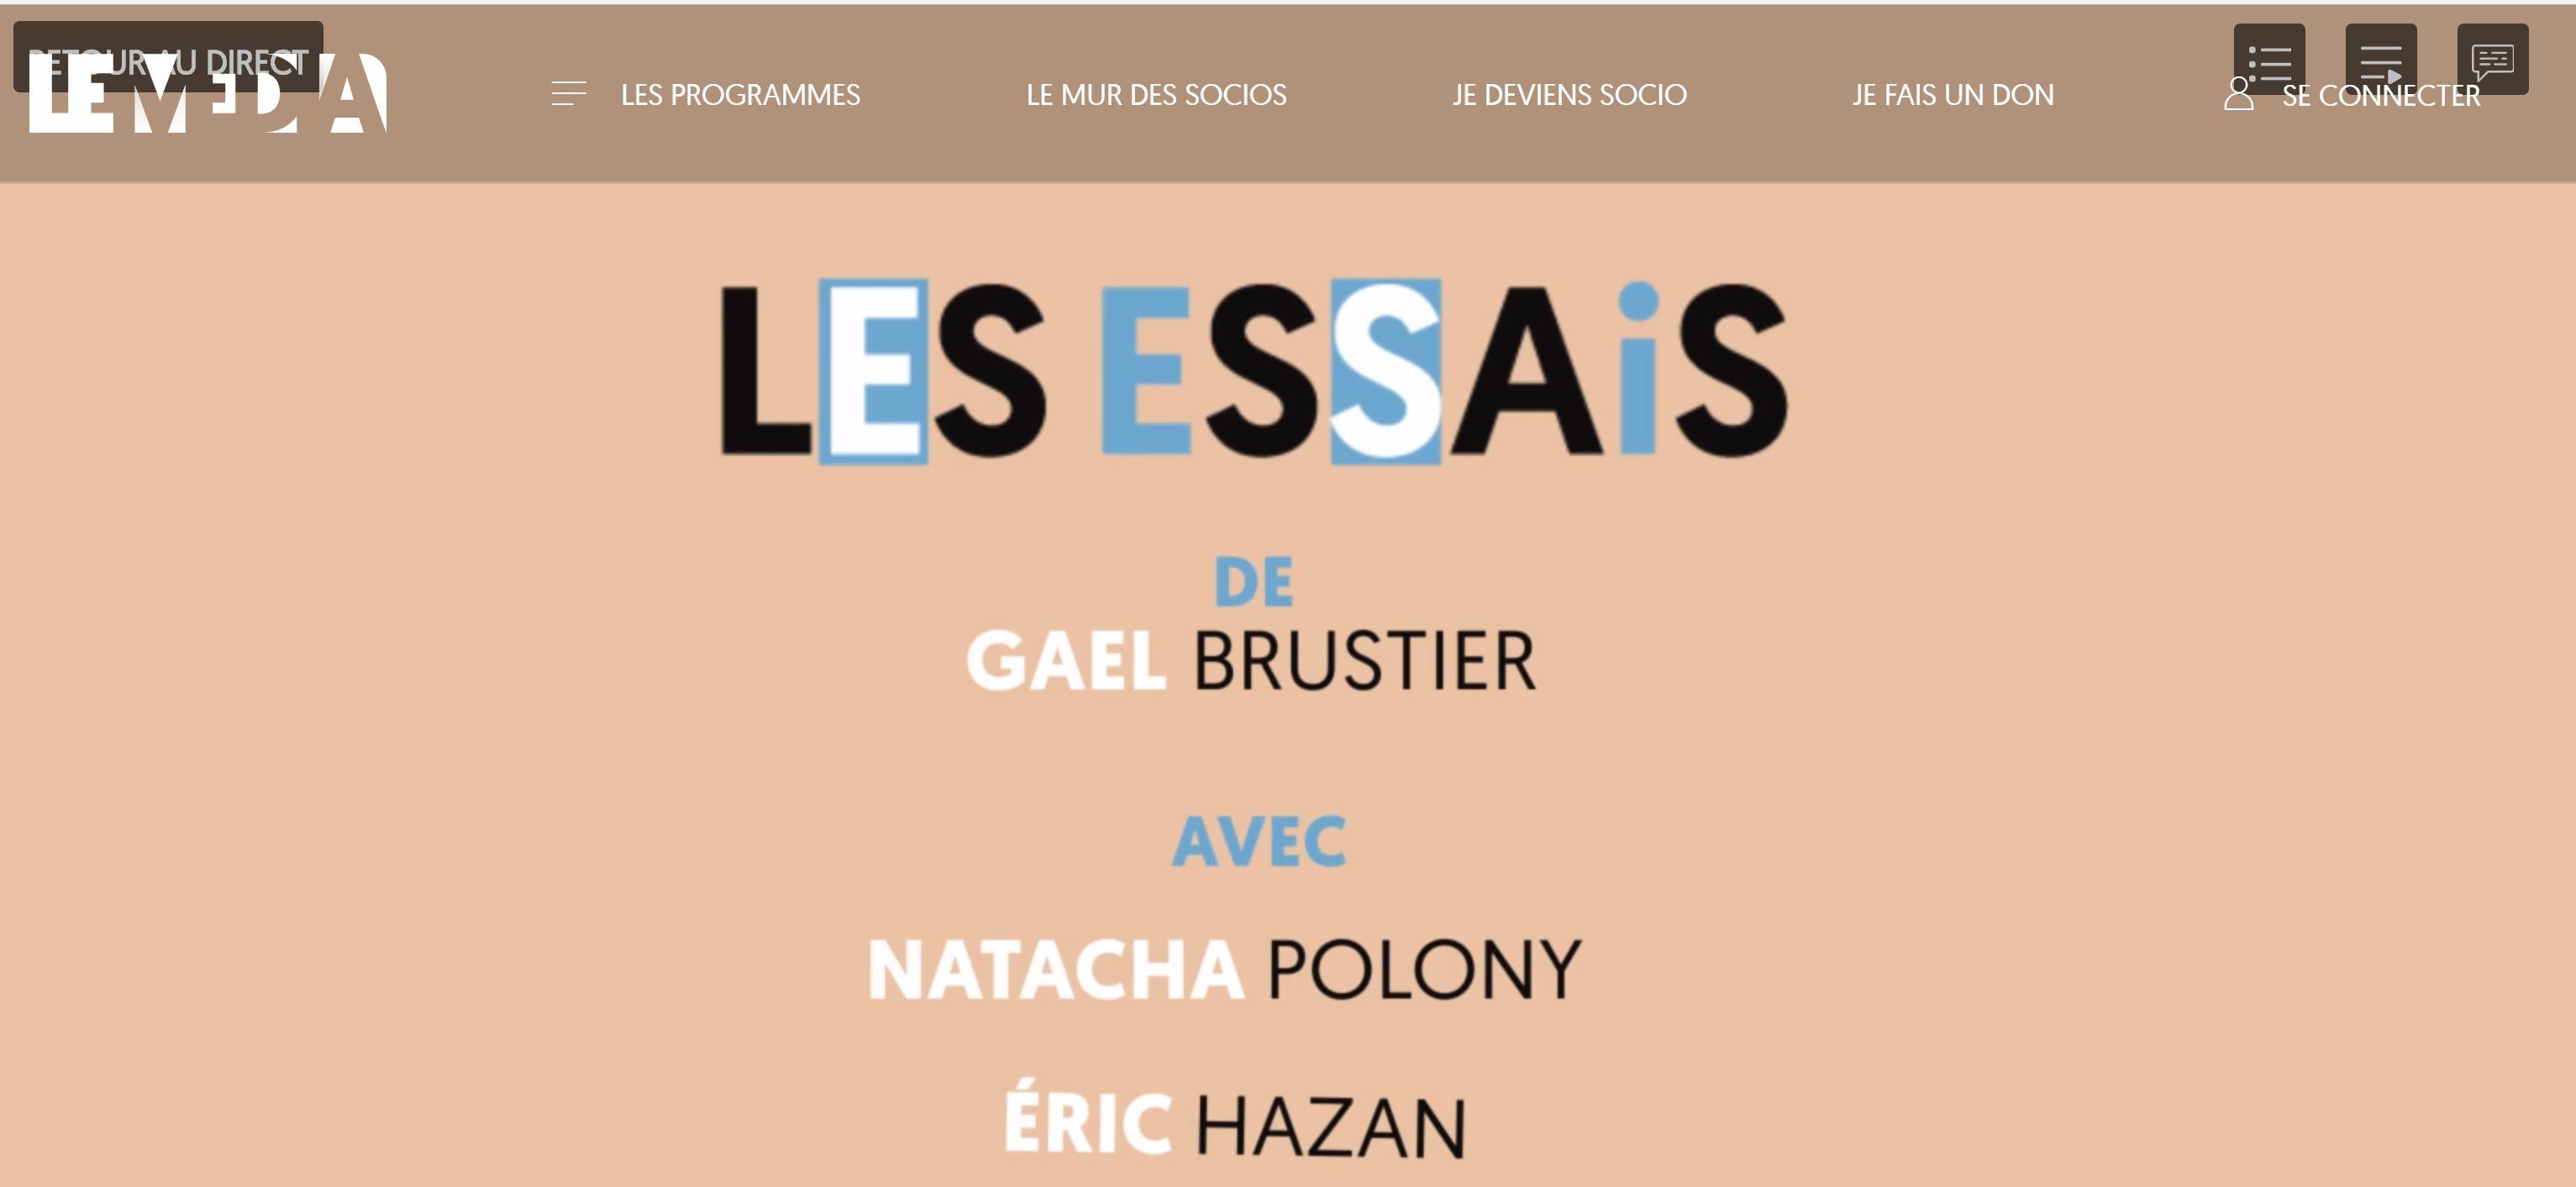 les-essais-de-Gael-Brustier-avec-Eric-Hazan-et-Natacha-Polony.jpg